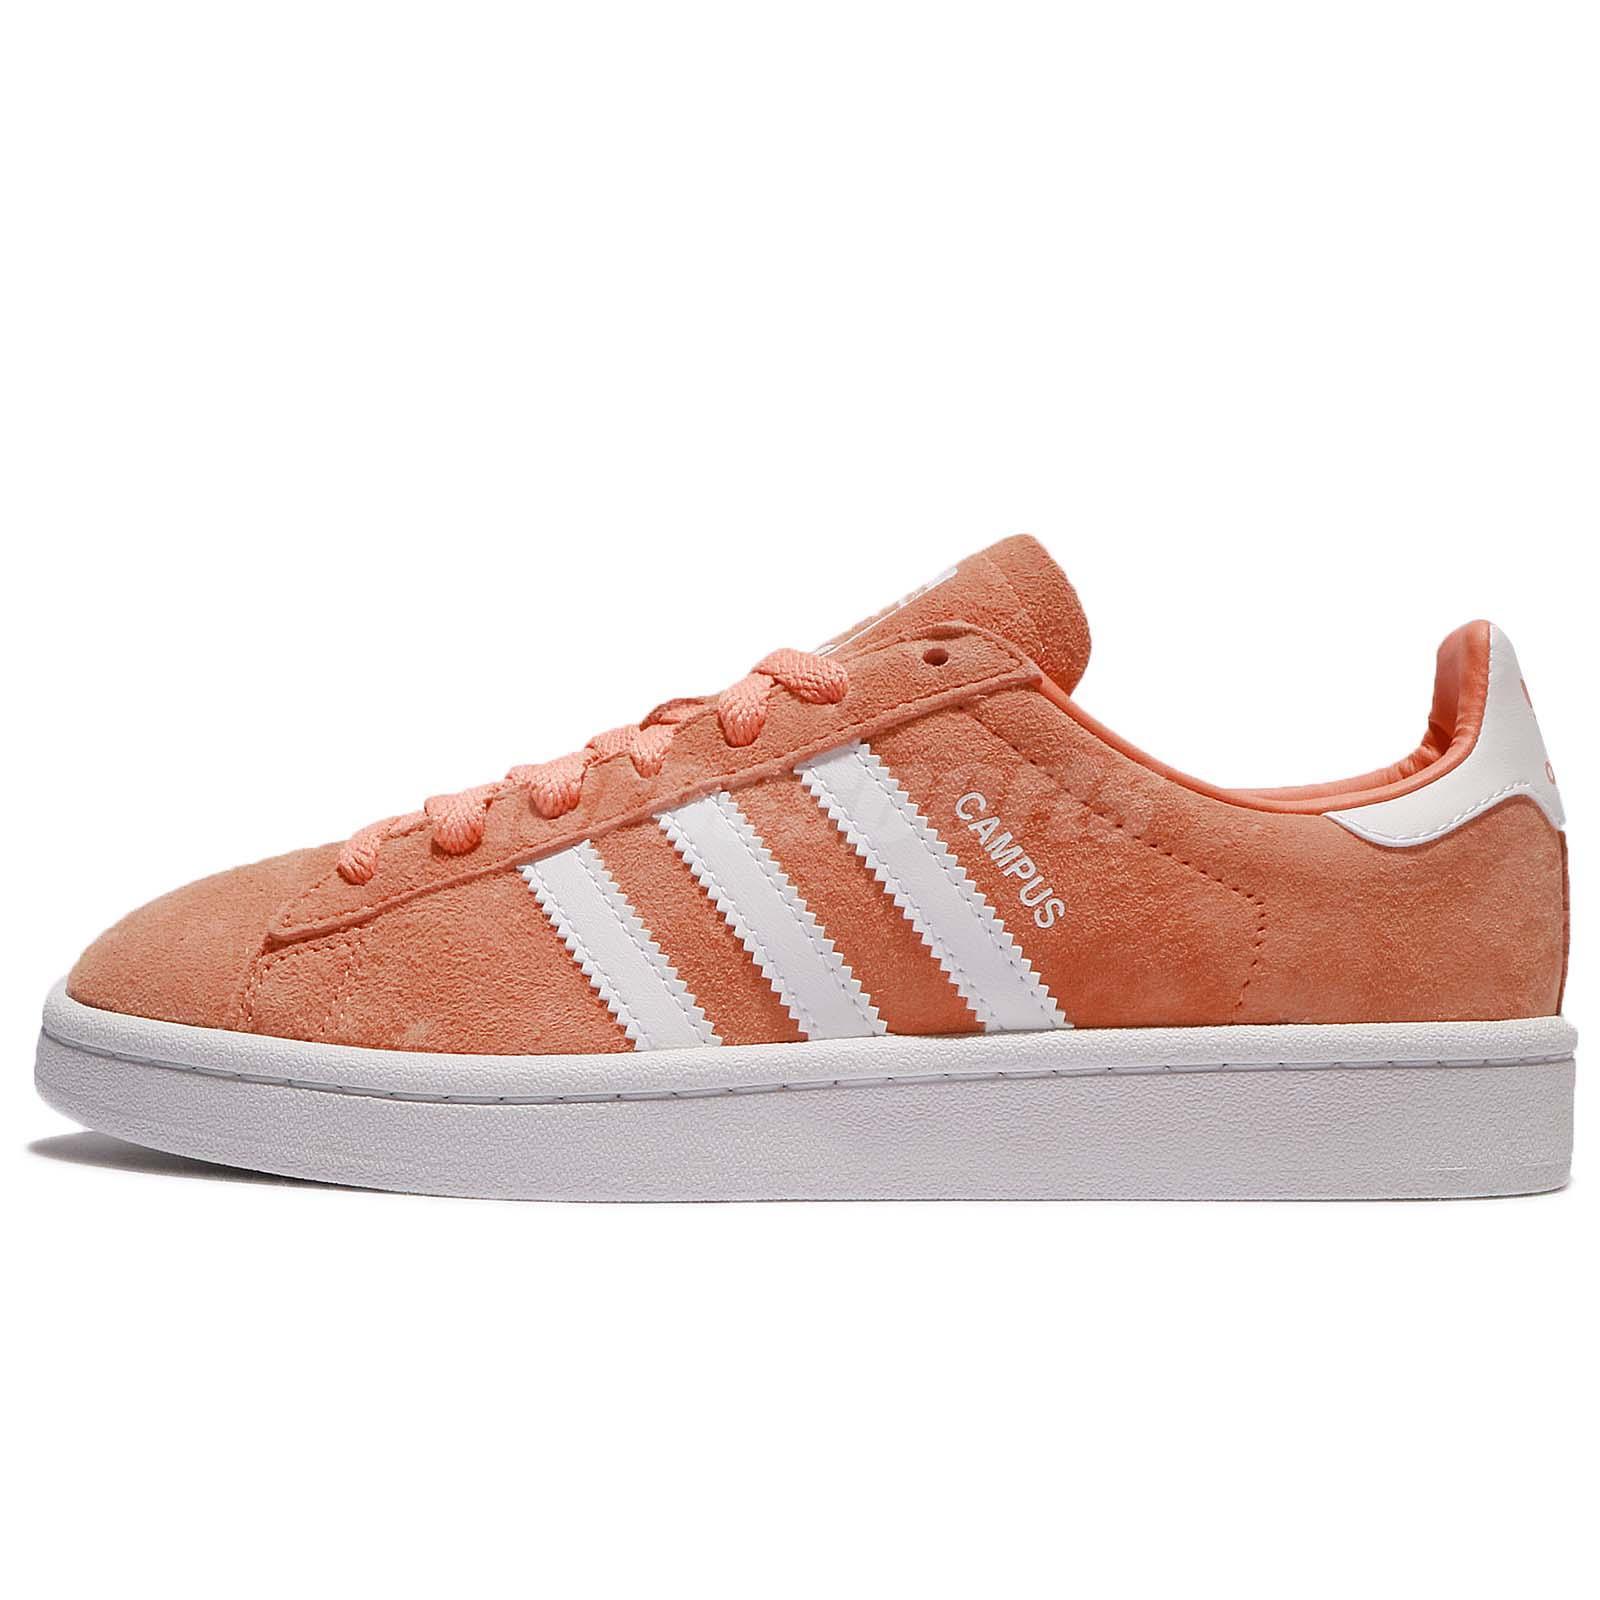 4d5cc396e1b2 adidas Originals Campus Nubuck Orange White Men Women Shoes Sneakers BZ0083